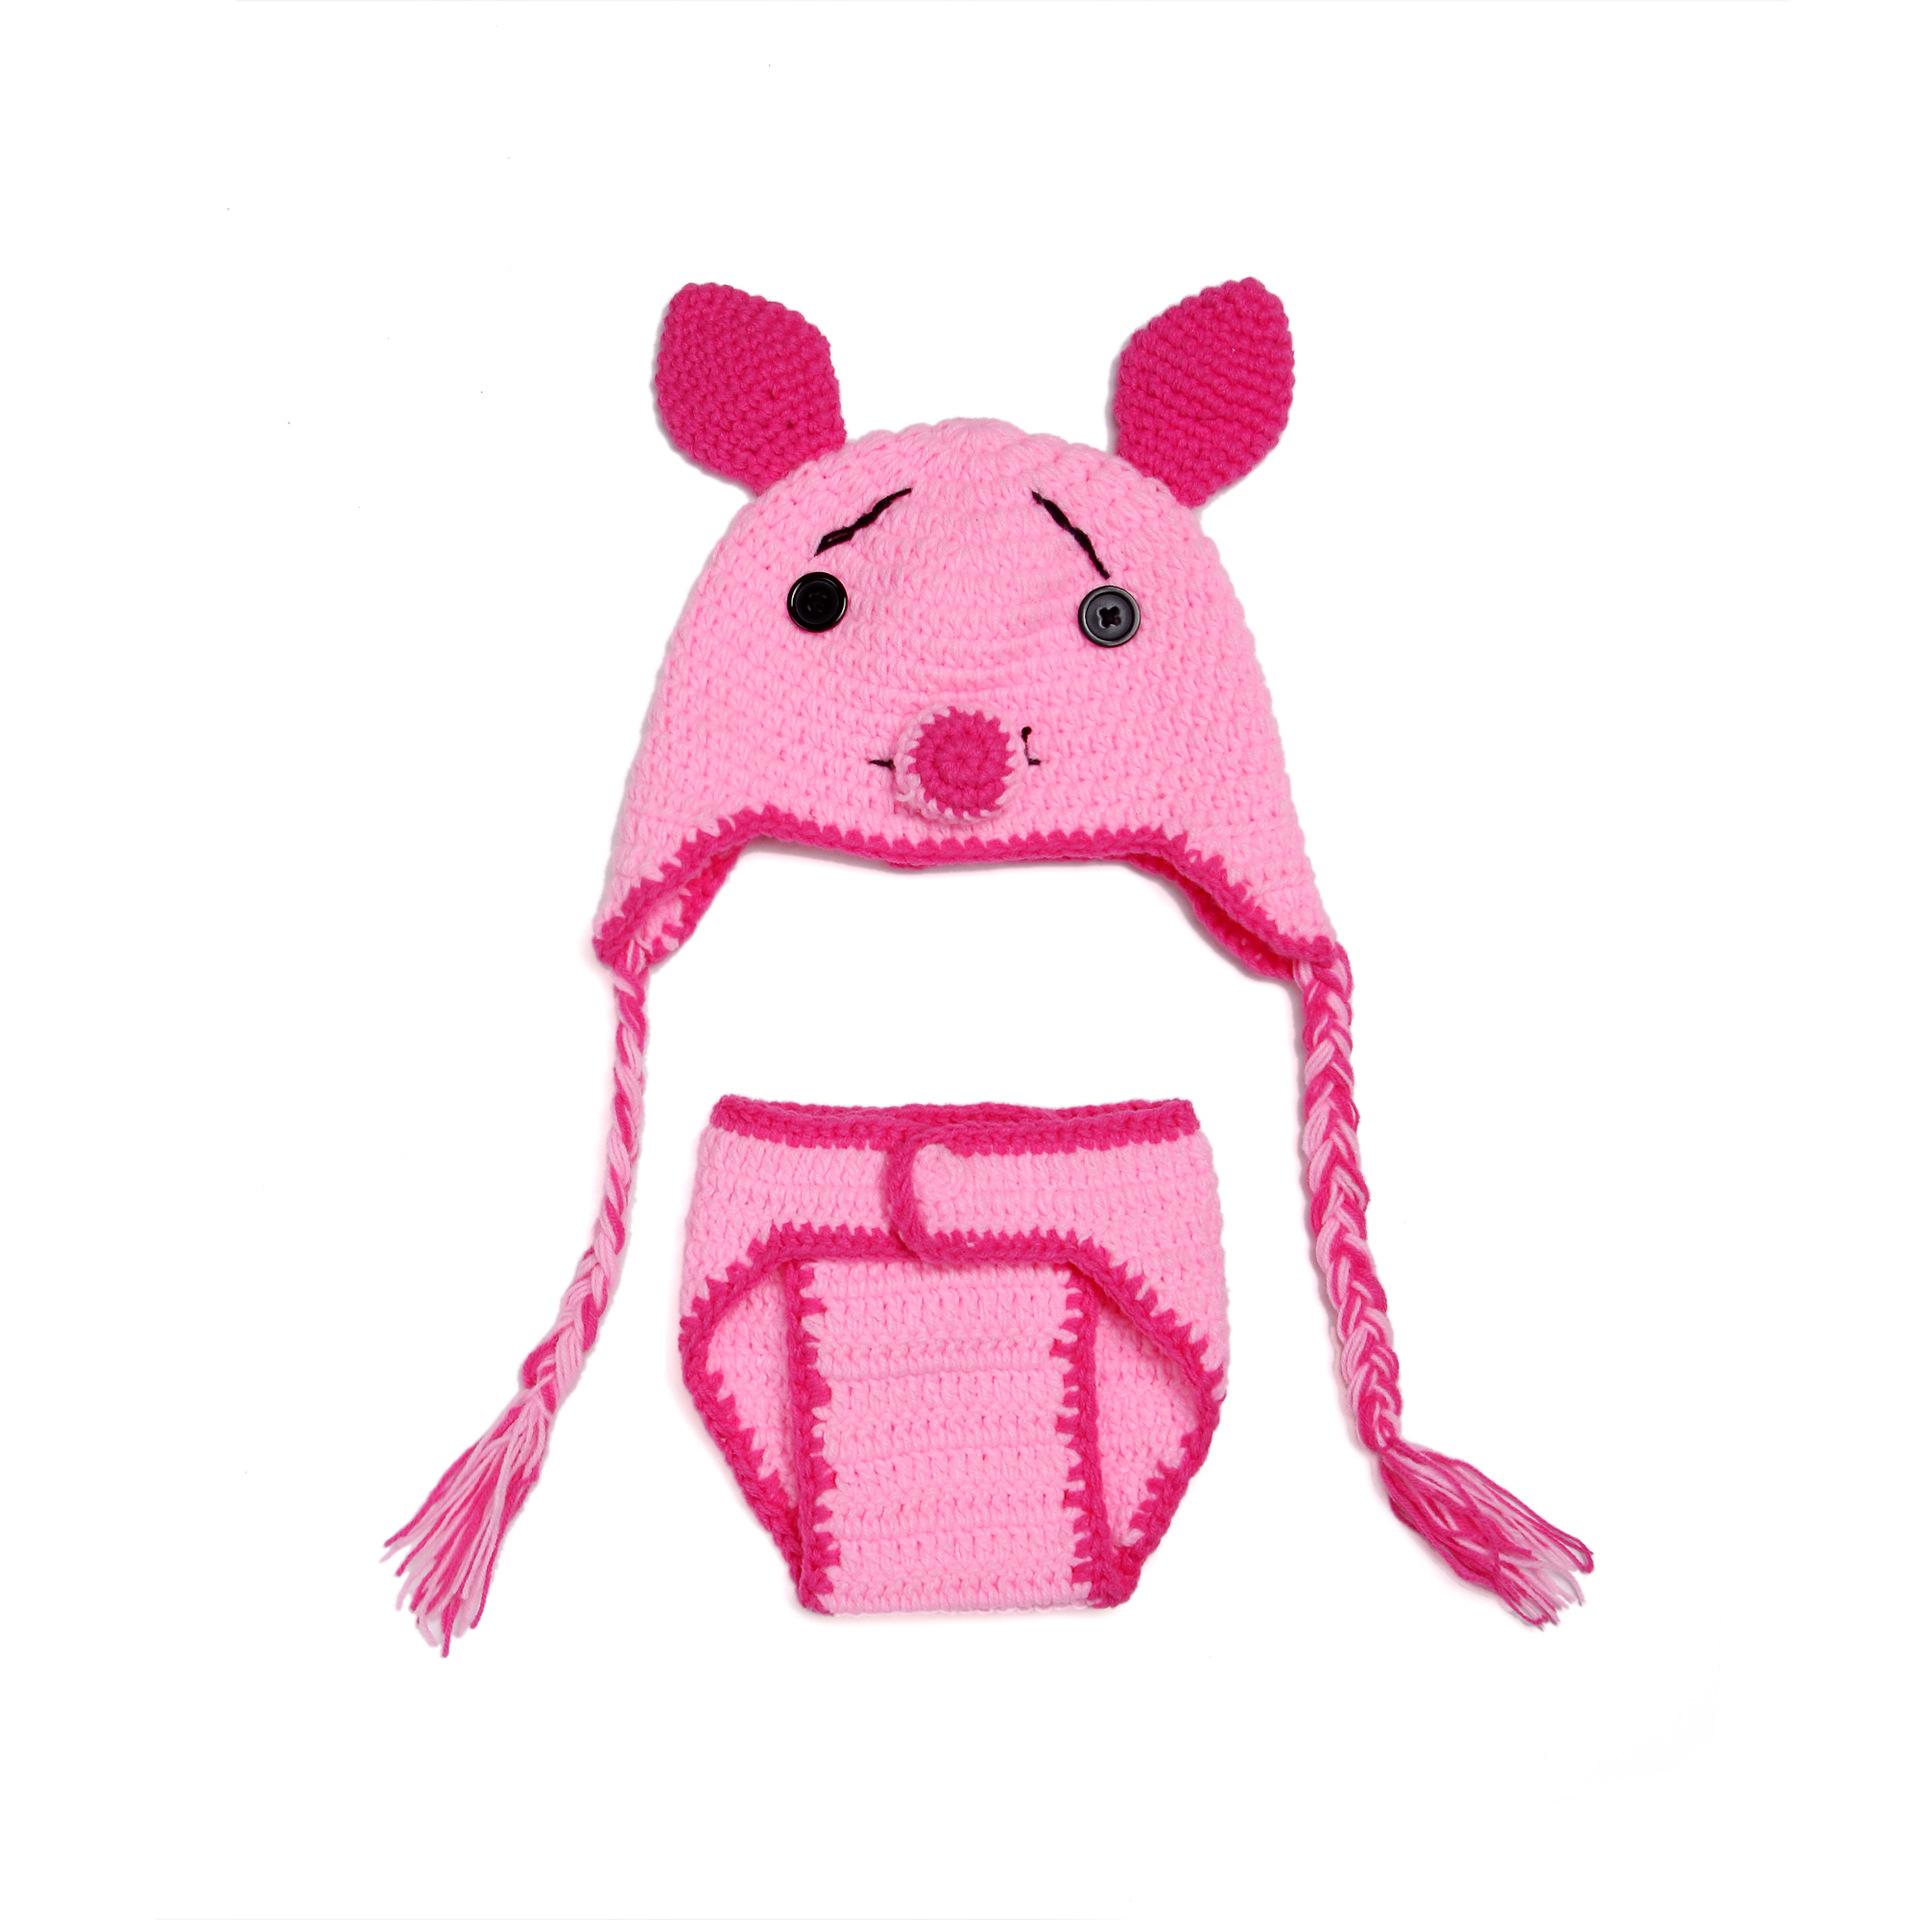 Knitting Pattern For Baby Oleg : New Design Animal Baby Girl Hat And Shorts Set Newborn Crochet Outfits Knitte...